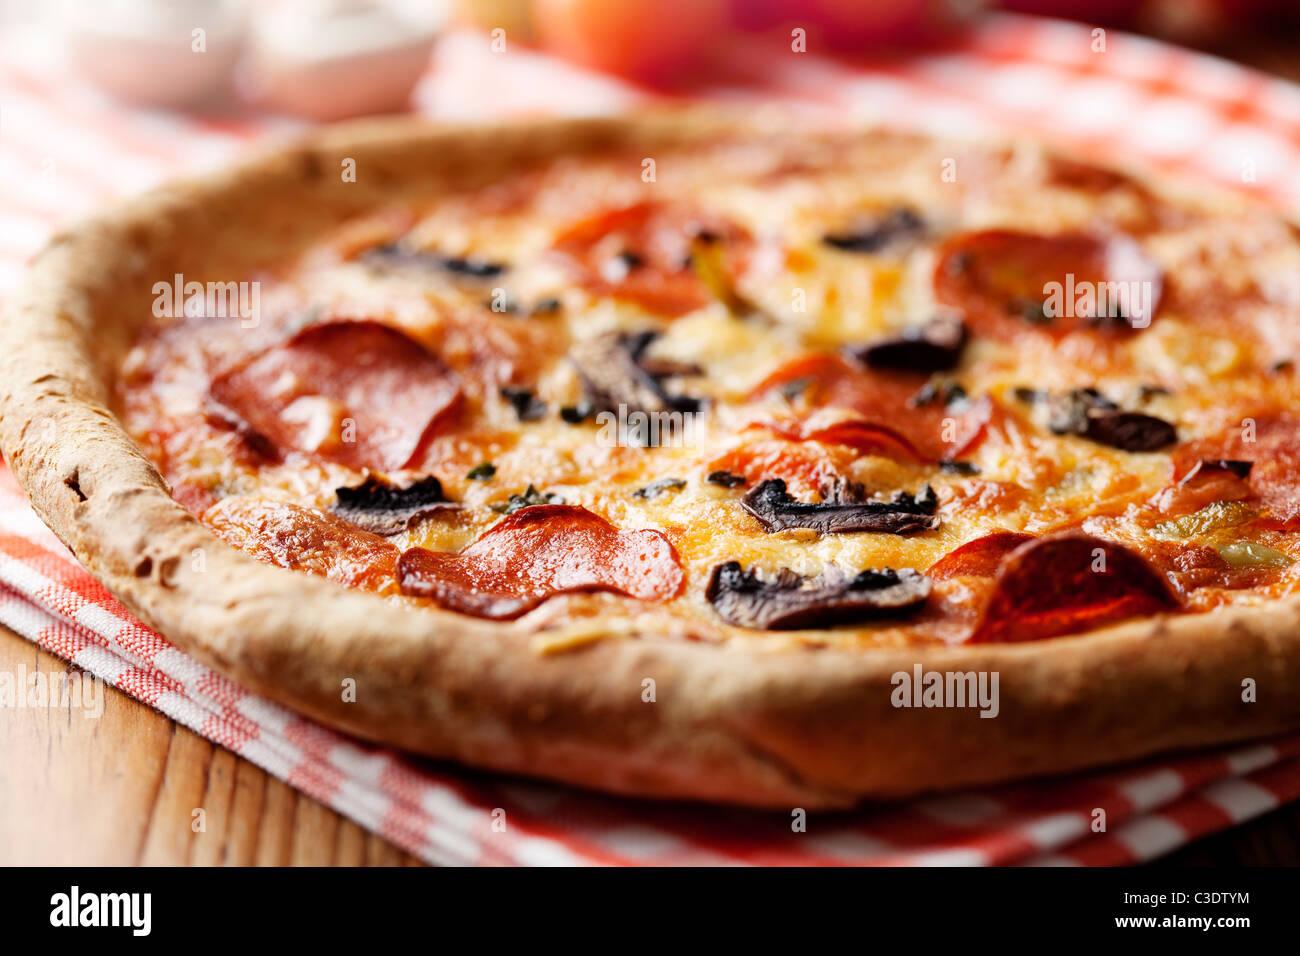 Salsiccia per pizza e pizza mushrooom closeup, shallow dof Immagini Stock